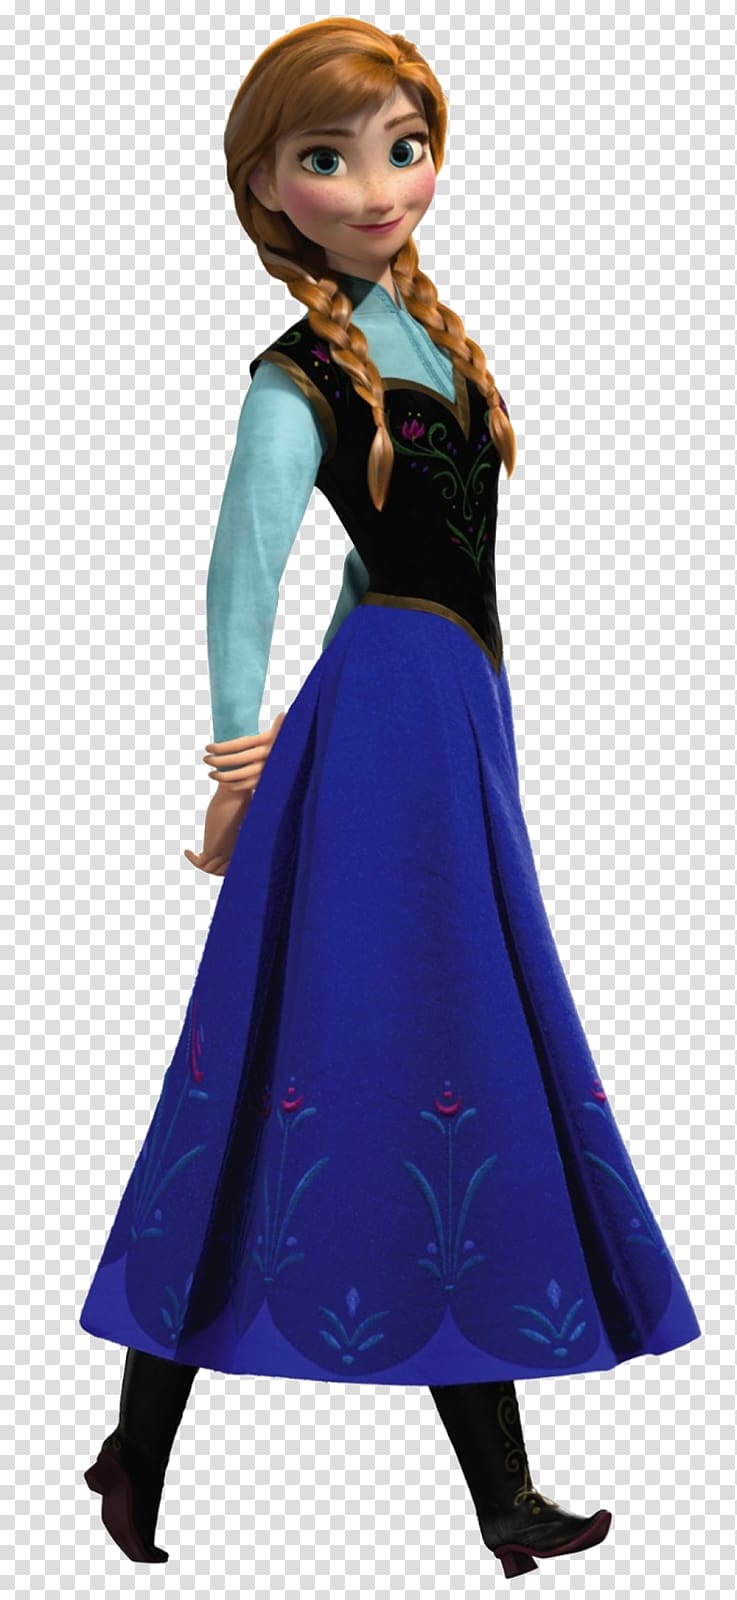 Disney Frozen Anna, Elsa Kristoff Anna Frozen Olaf, elsa transparent.